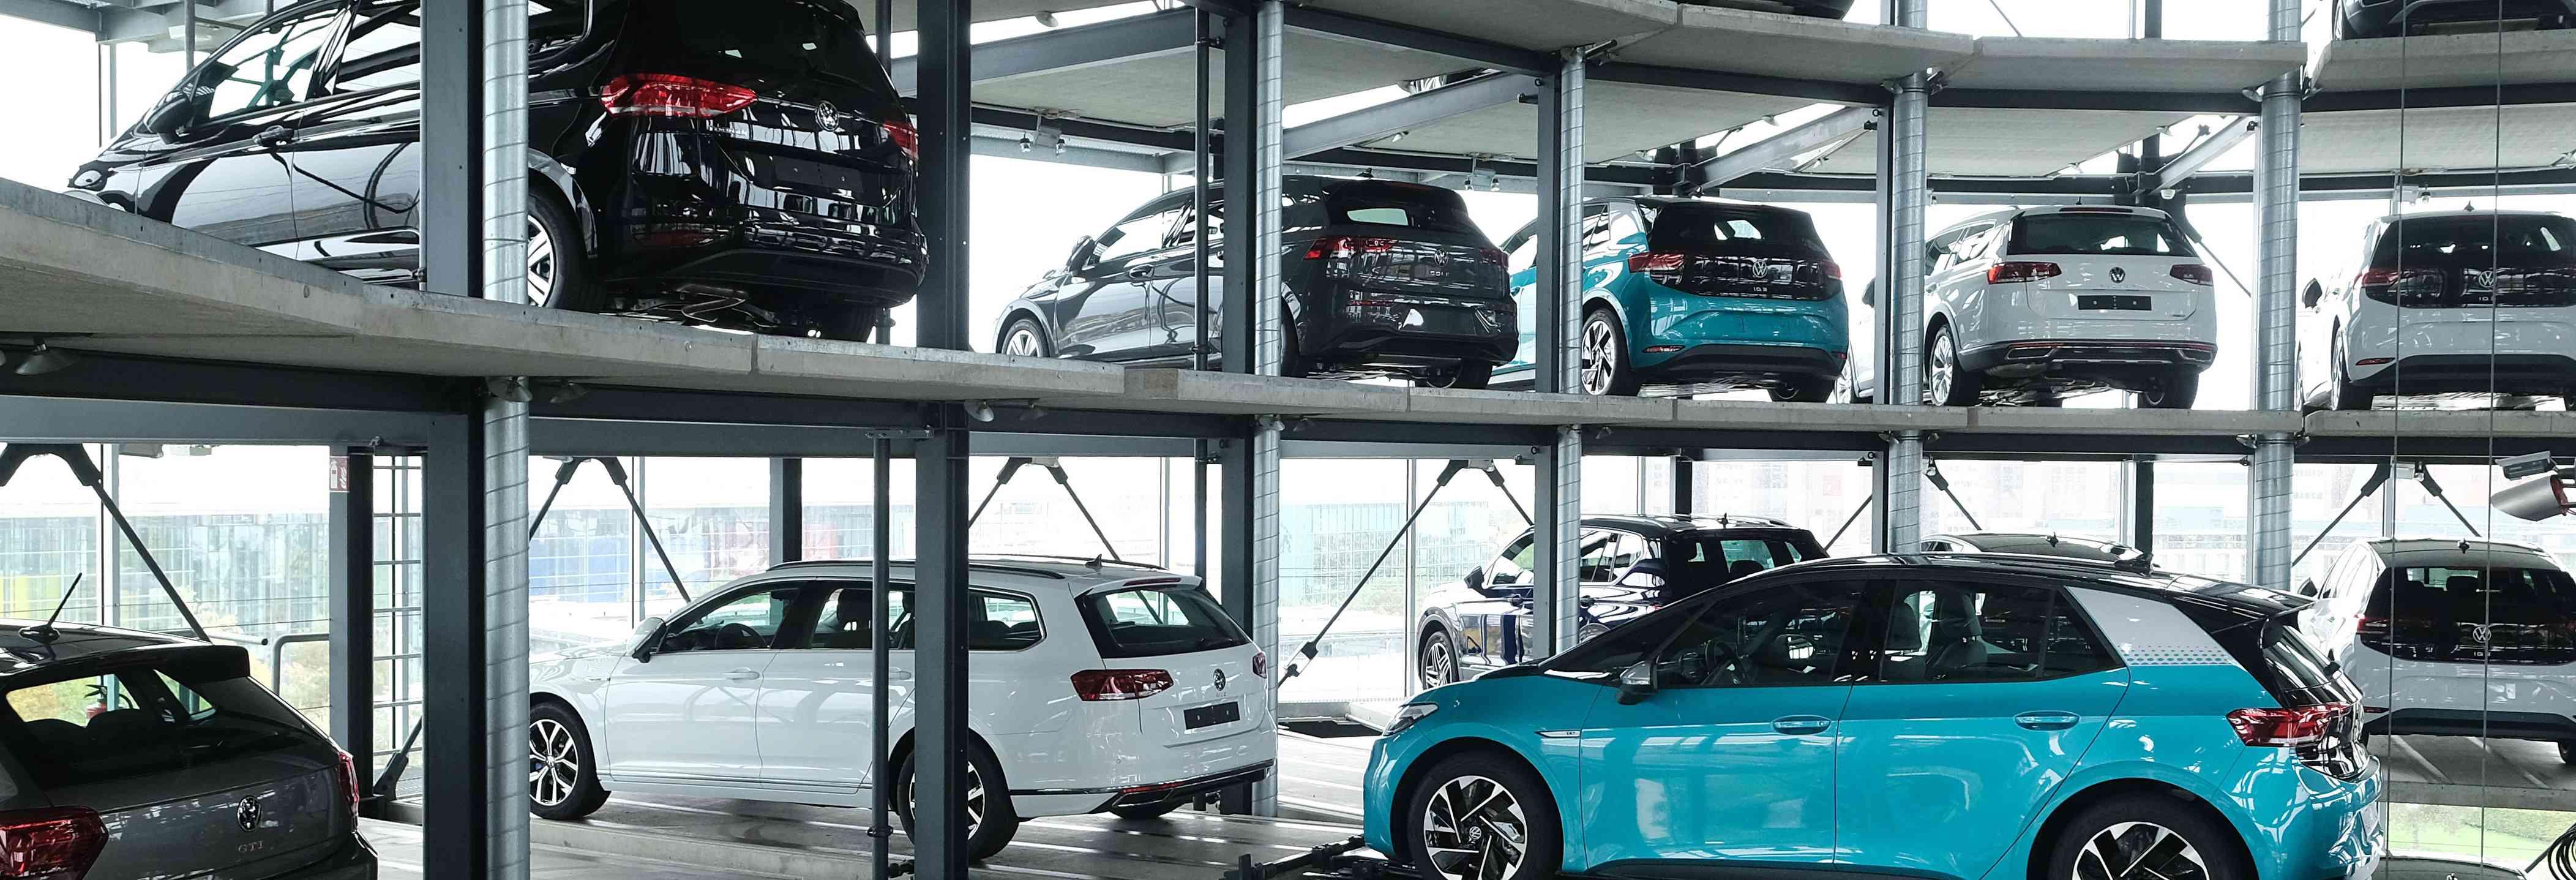 VW production facility